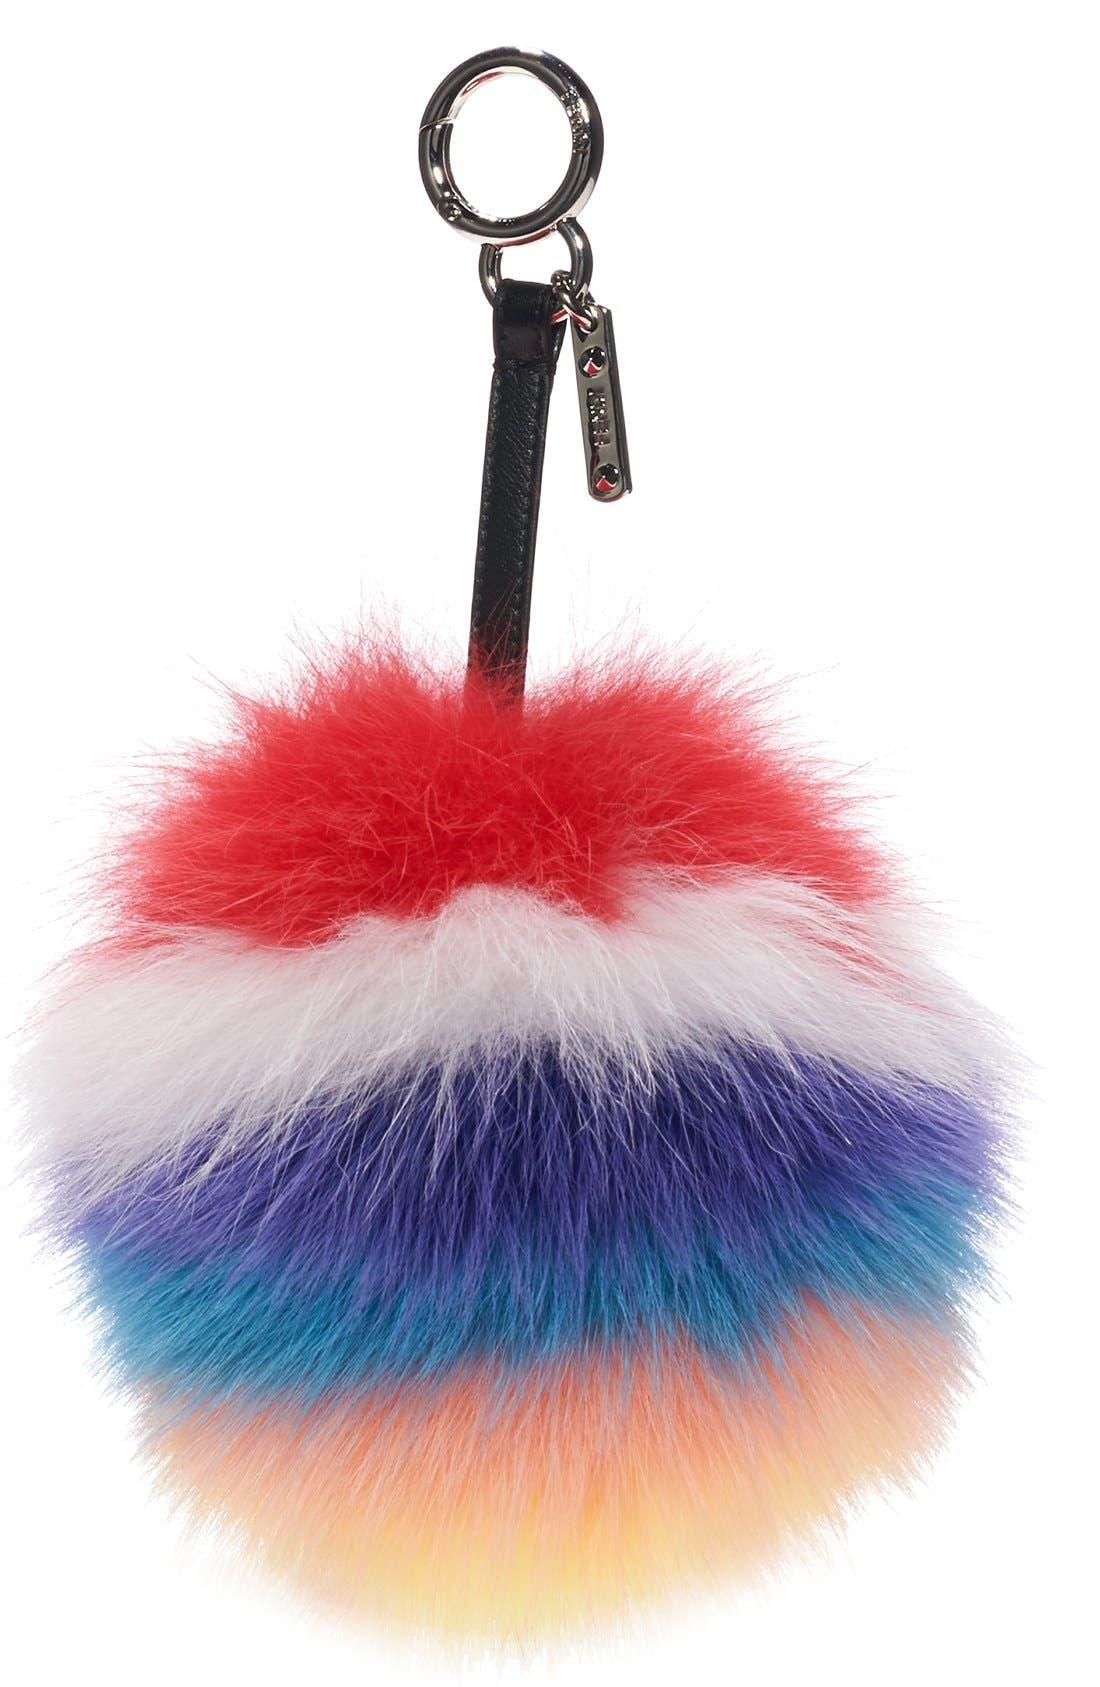 Alternate Image 1 Selected - Fendi Genuine Fox Fur Bag Charm